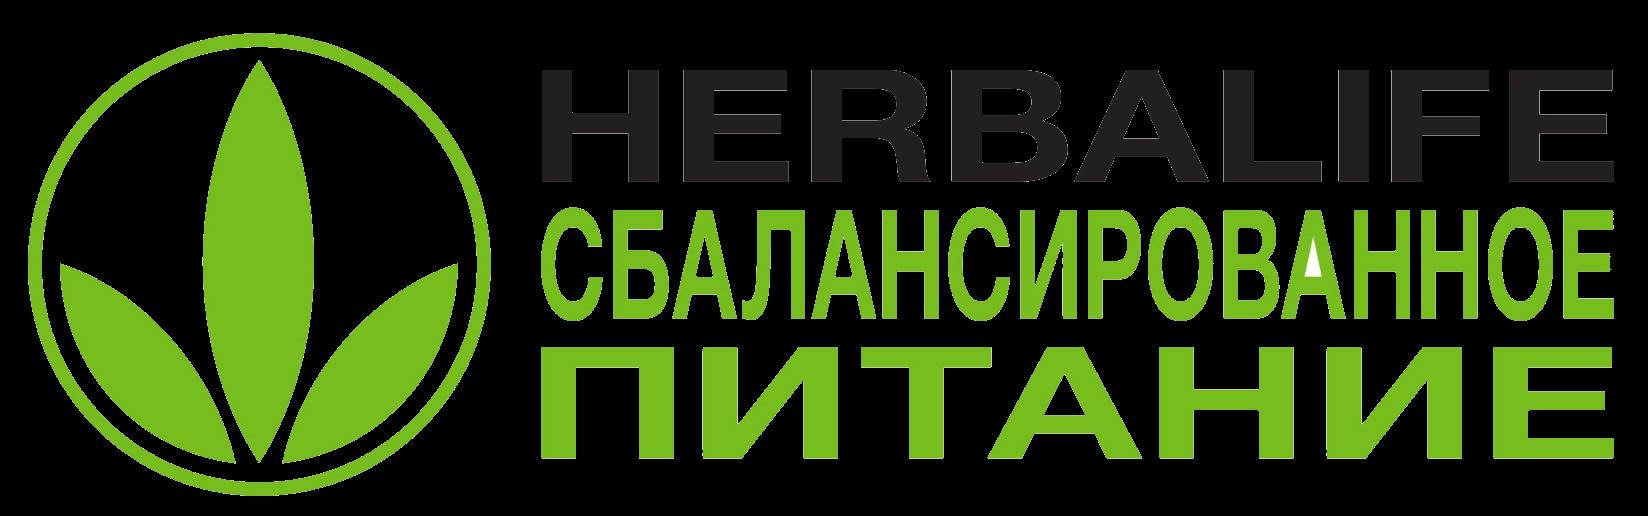 Herbalife Nutrition Logo Transparent - Herbalife Leaf Logo